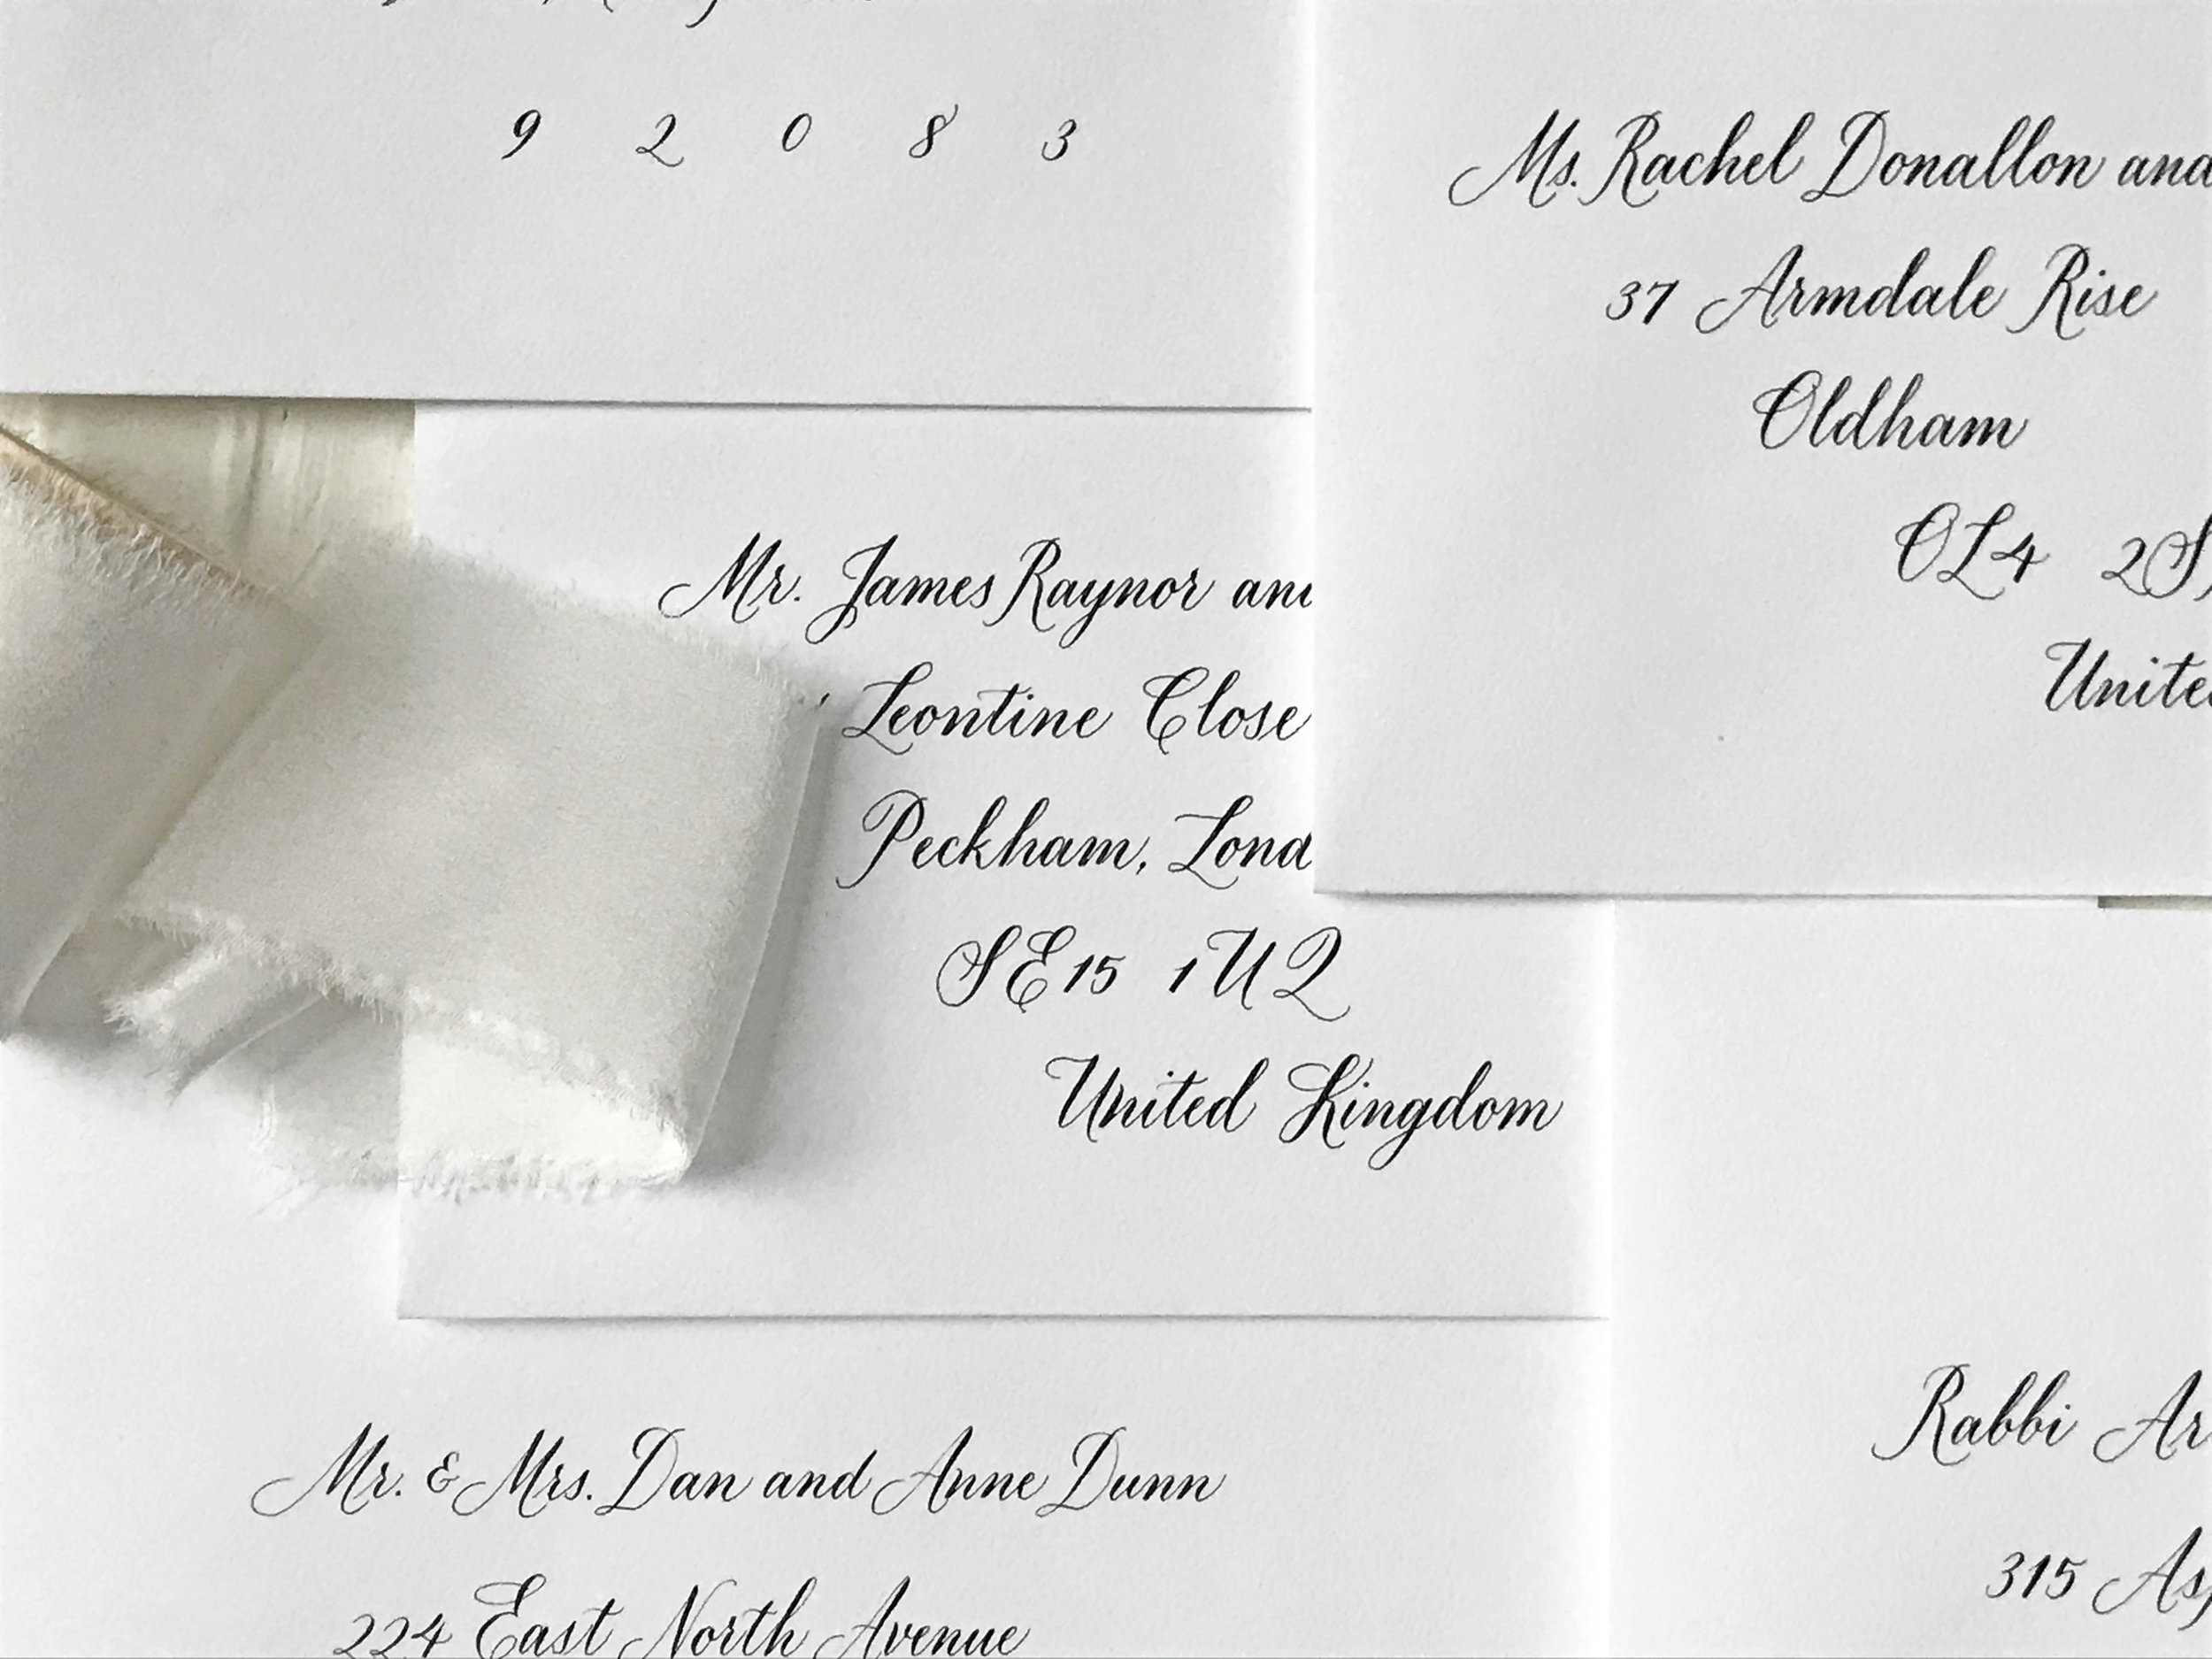 Murawski-Freed envelopes (3).jpg